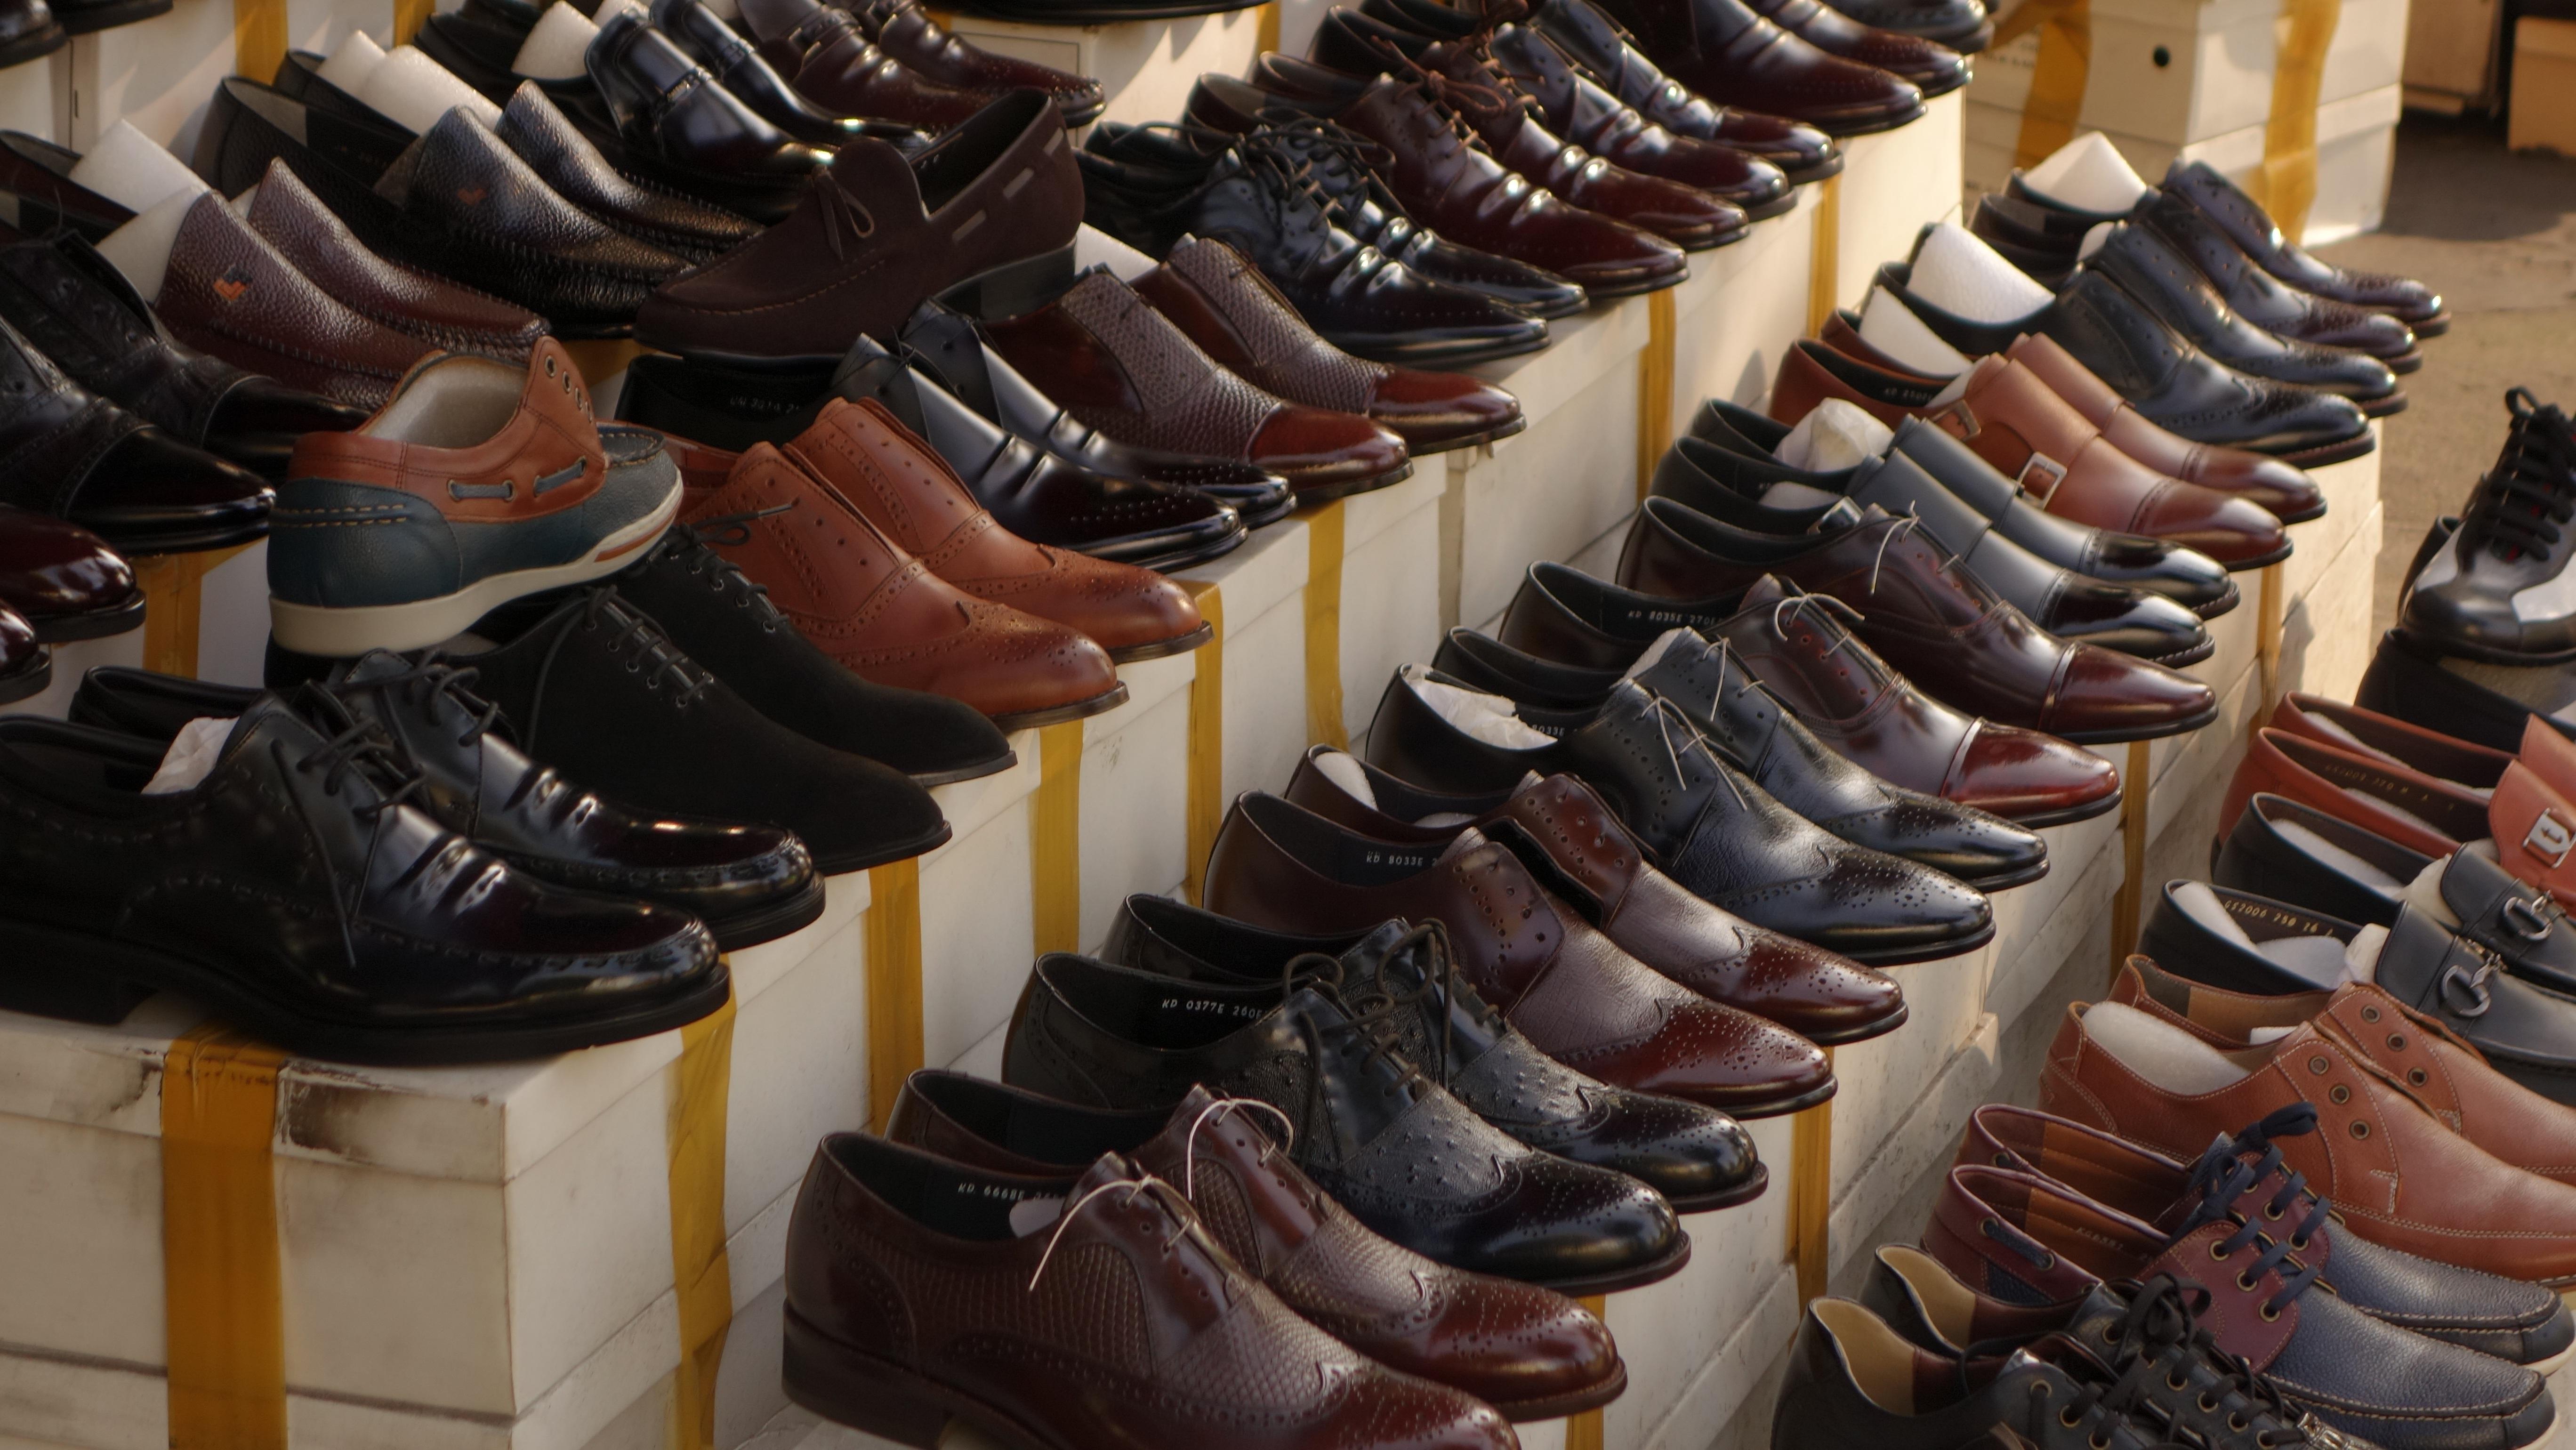 286e85b98 zapato tienda comida marrón mercado negro Zapatos calzado centro comercial  los zapatos de cuero Zapatos de